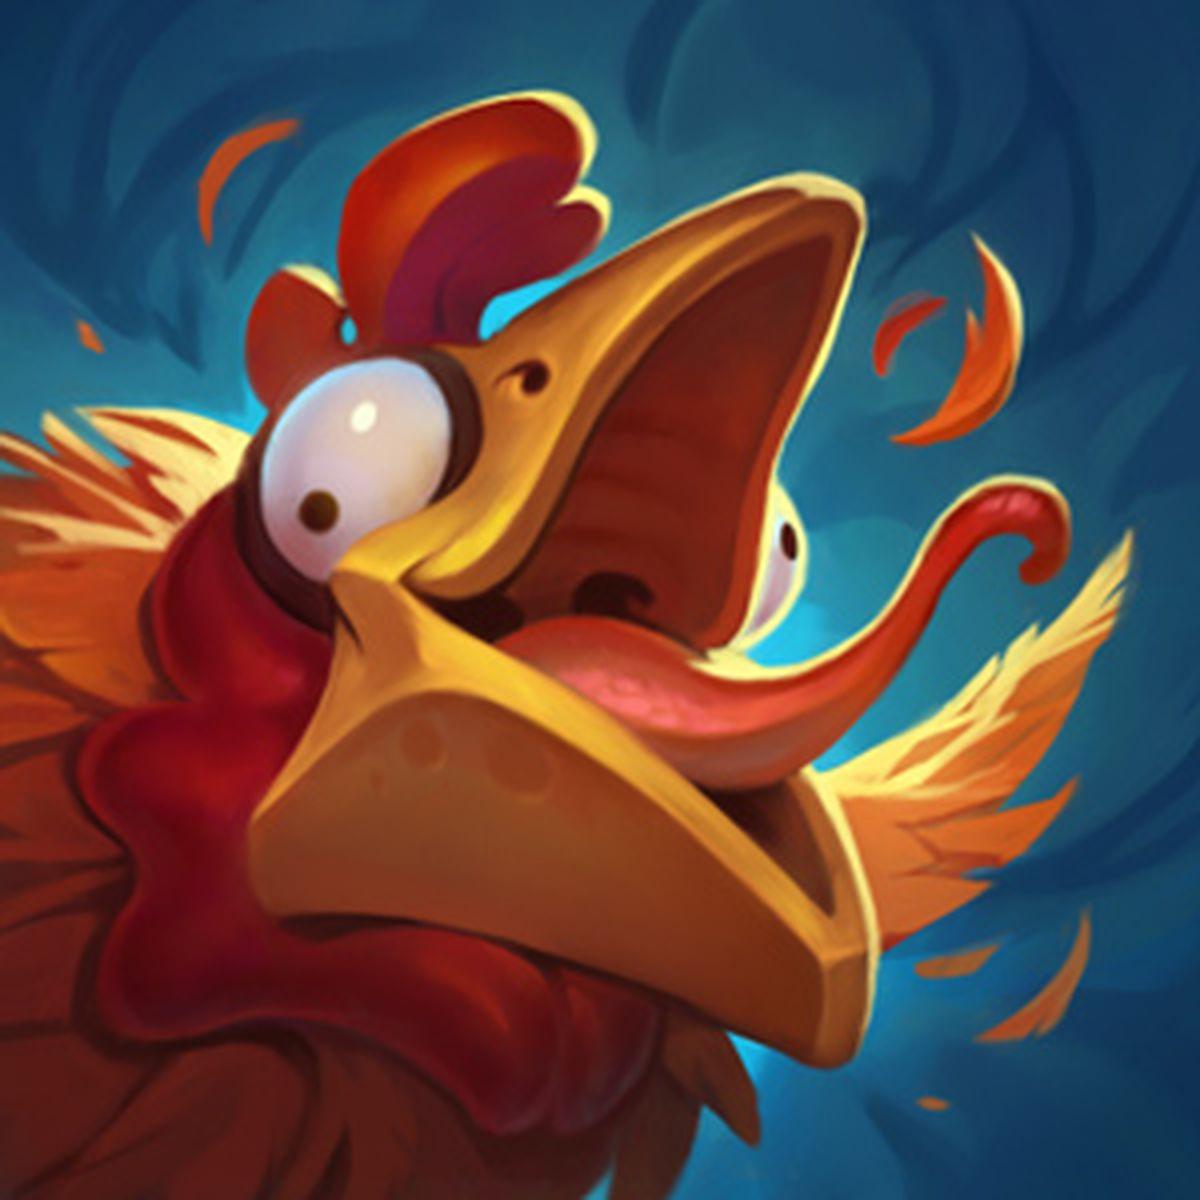 Cute Duck Wallpaper League Of Legends April Fools 2018 Mission Guide The